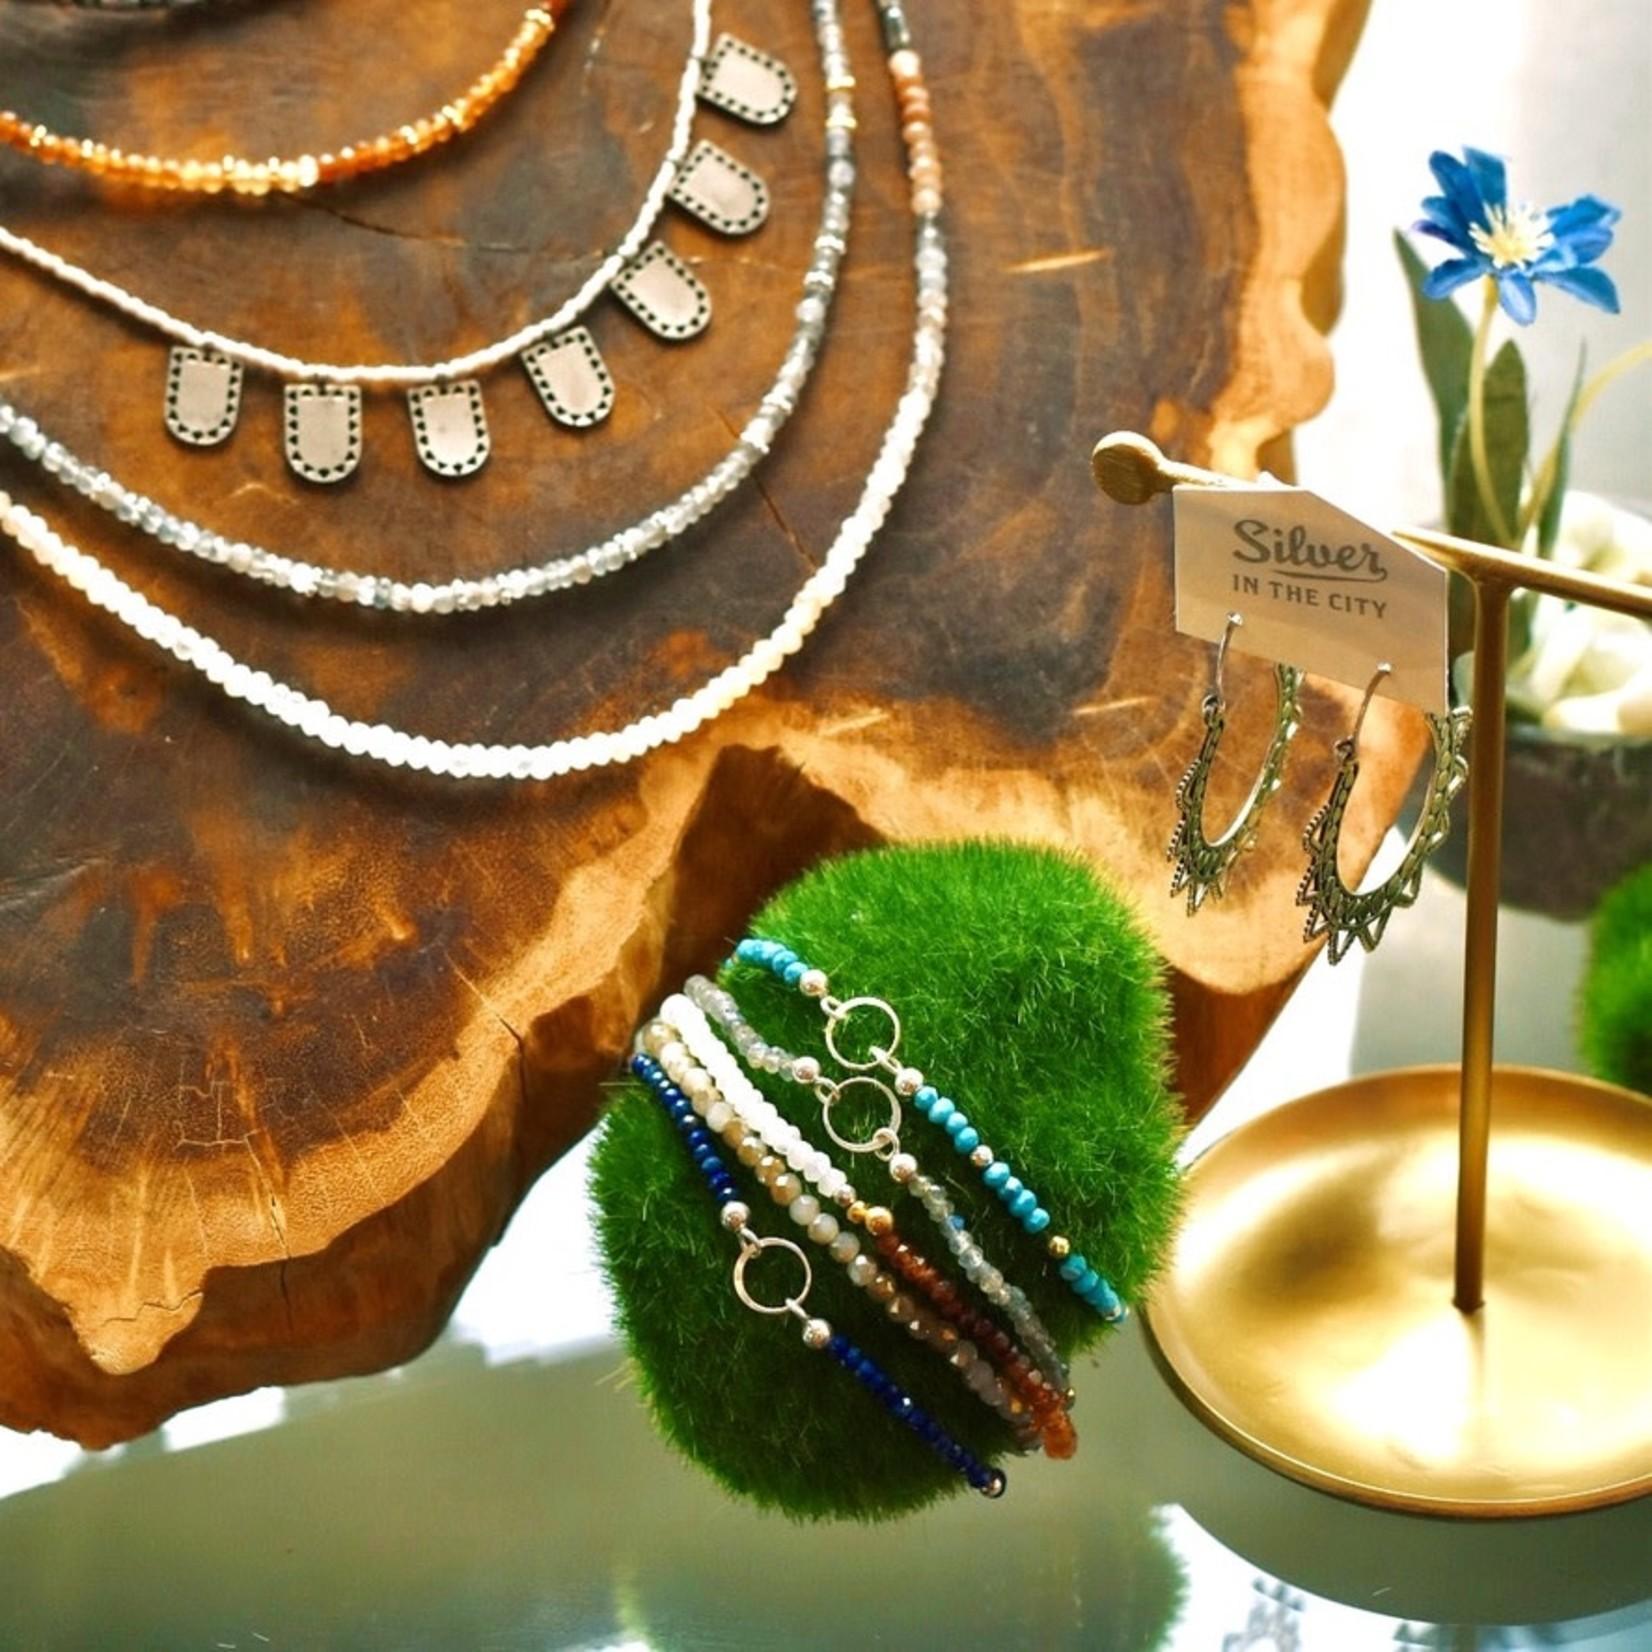 "4.25""L x 3.5""W x 5.5""H Antique Brass Finish Jewelry Stand"